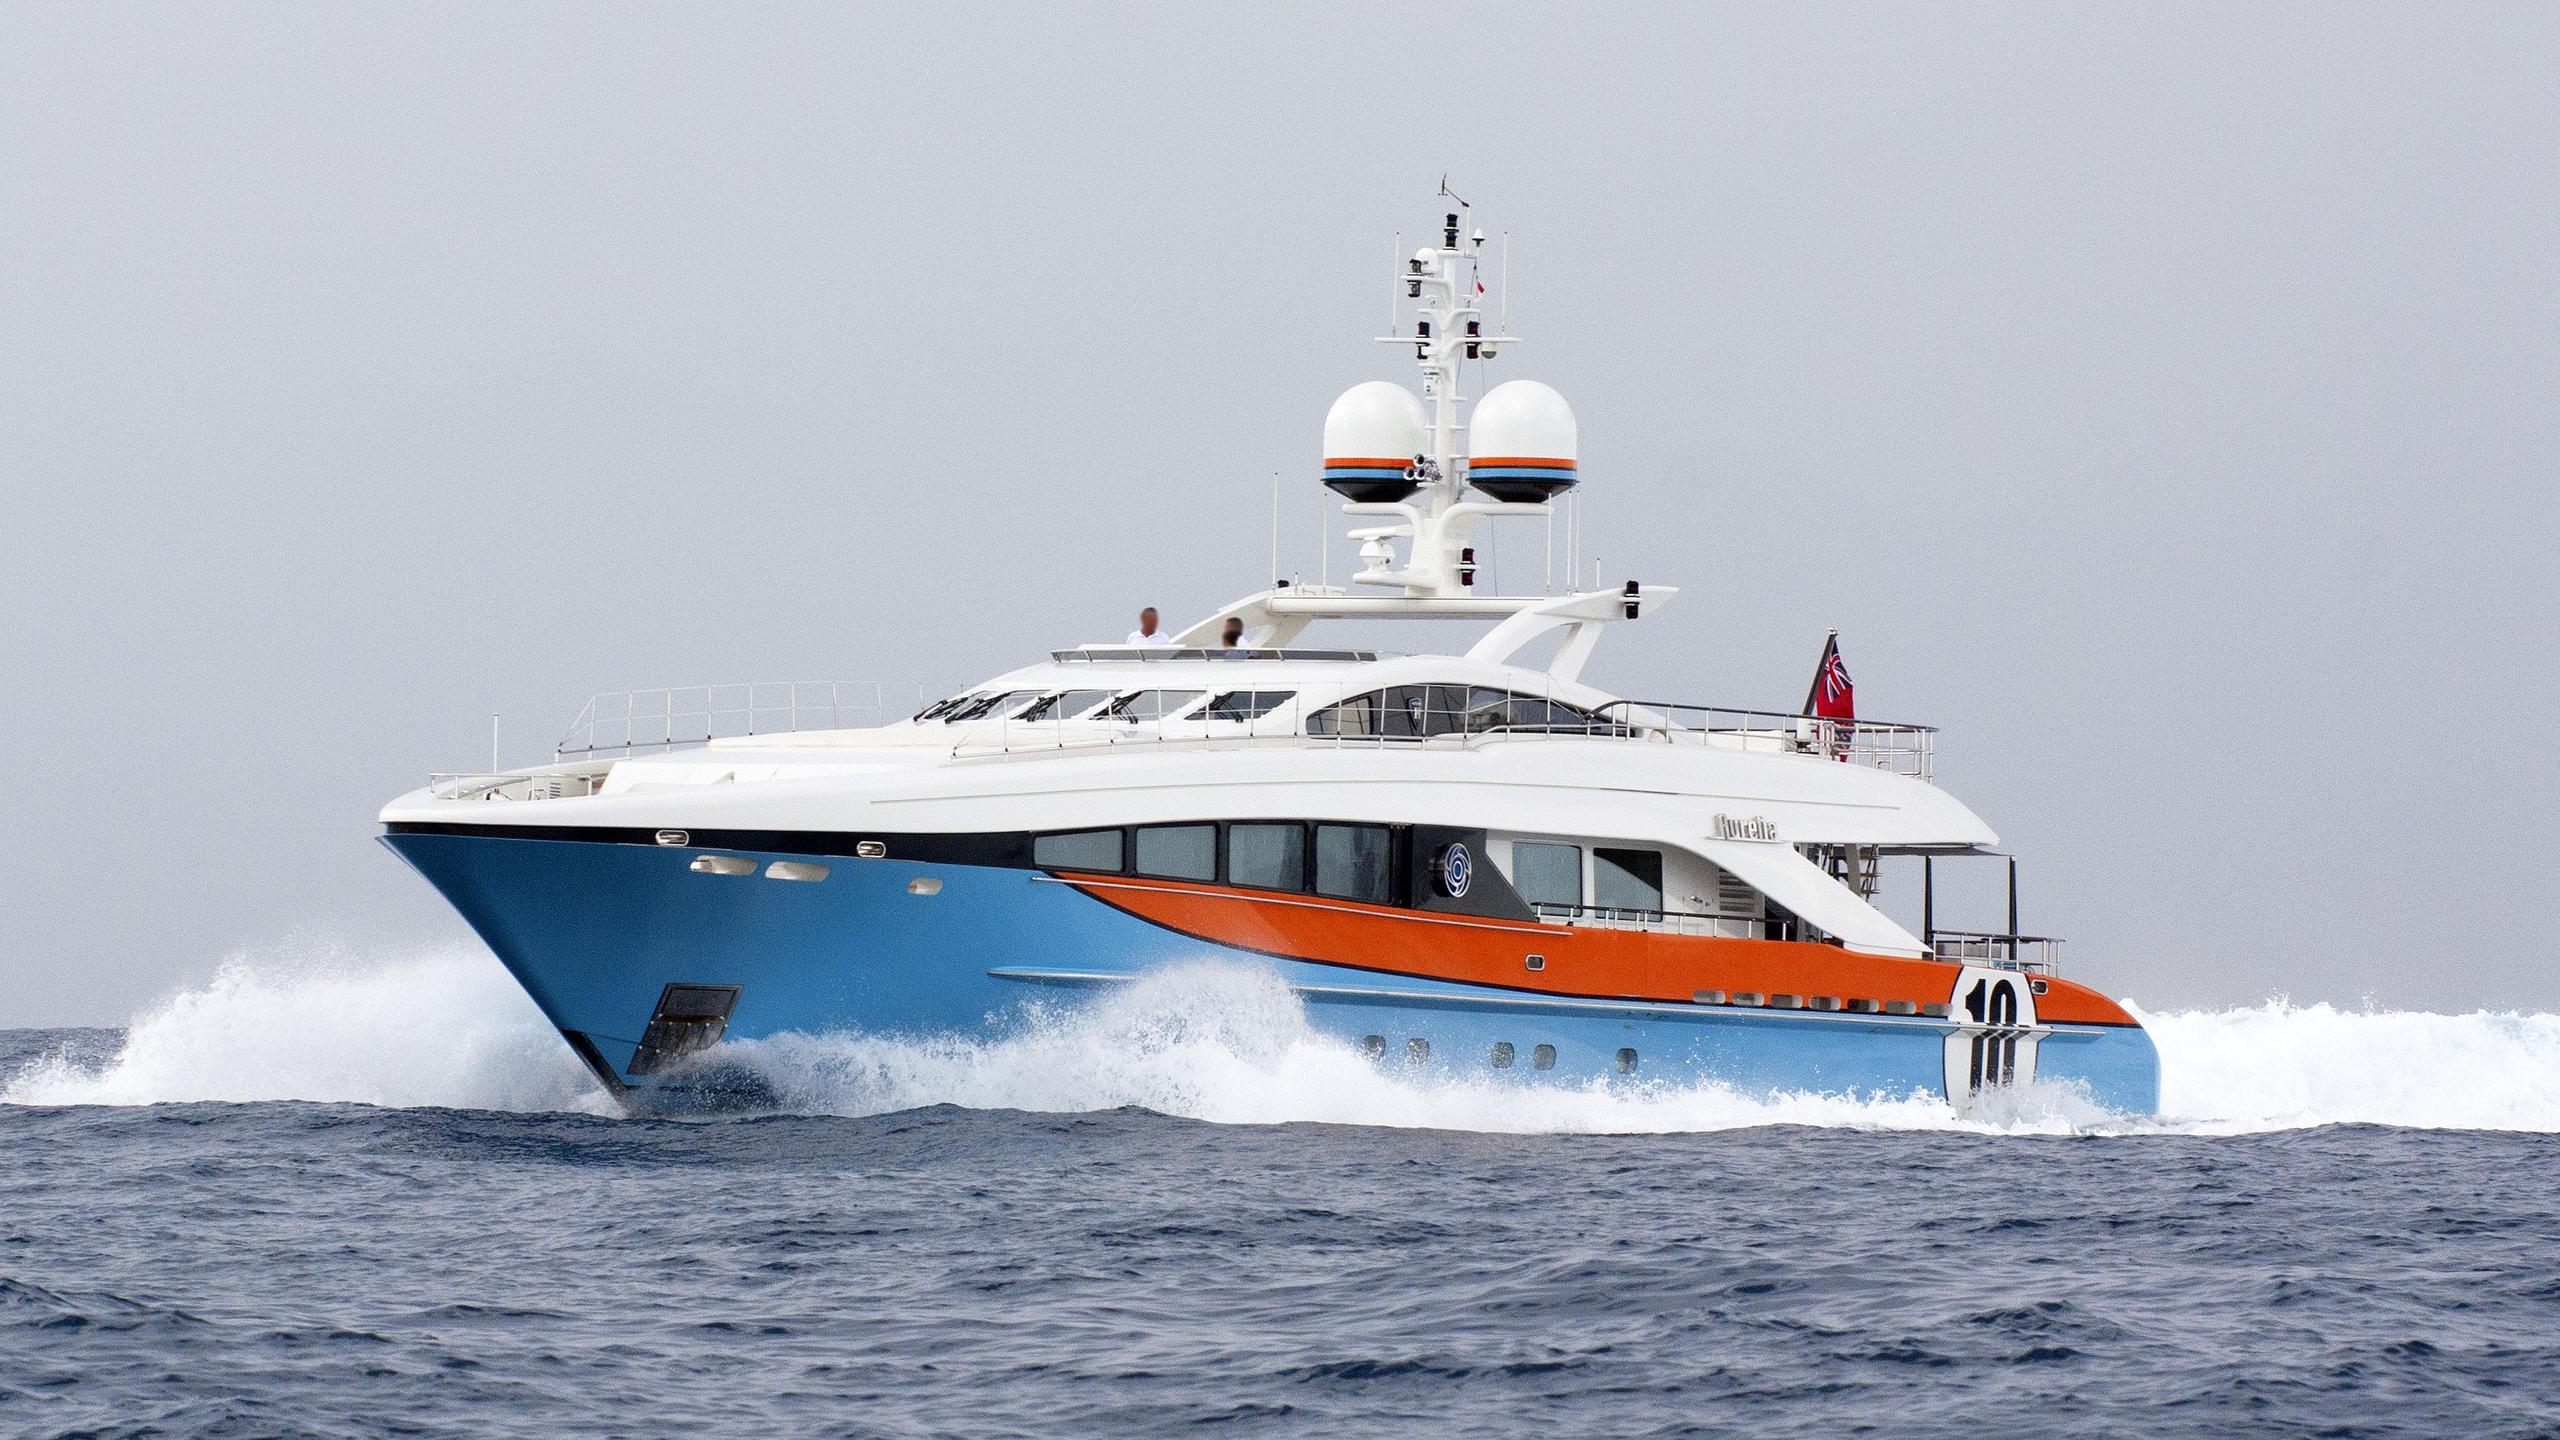 aurelia-motor-yacht-heesen-3700-20100-37m-half-profile